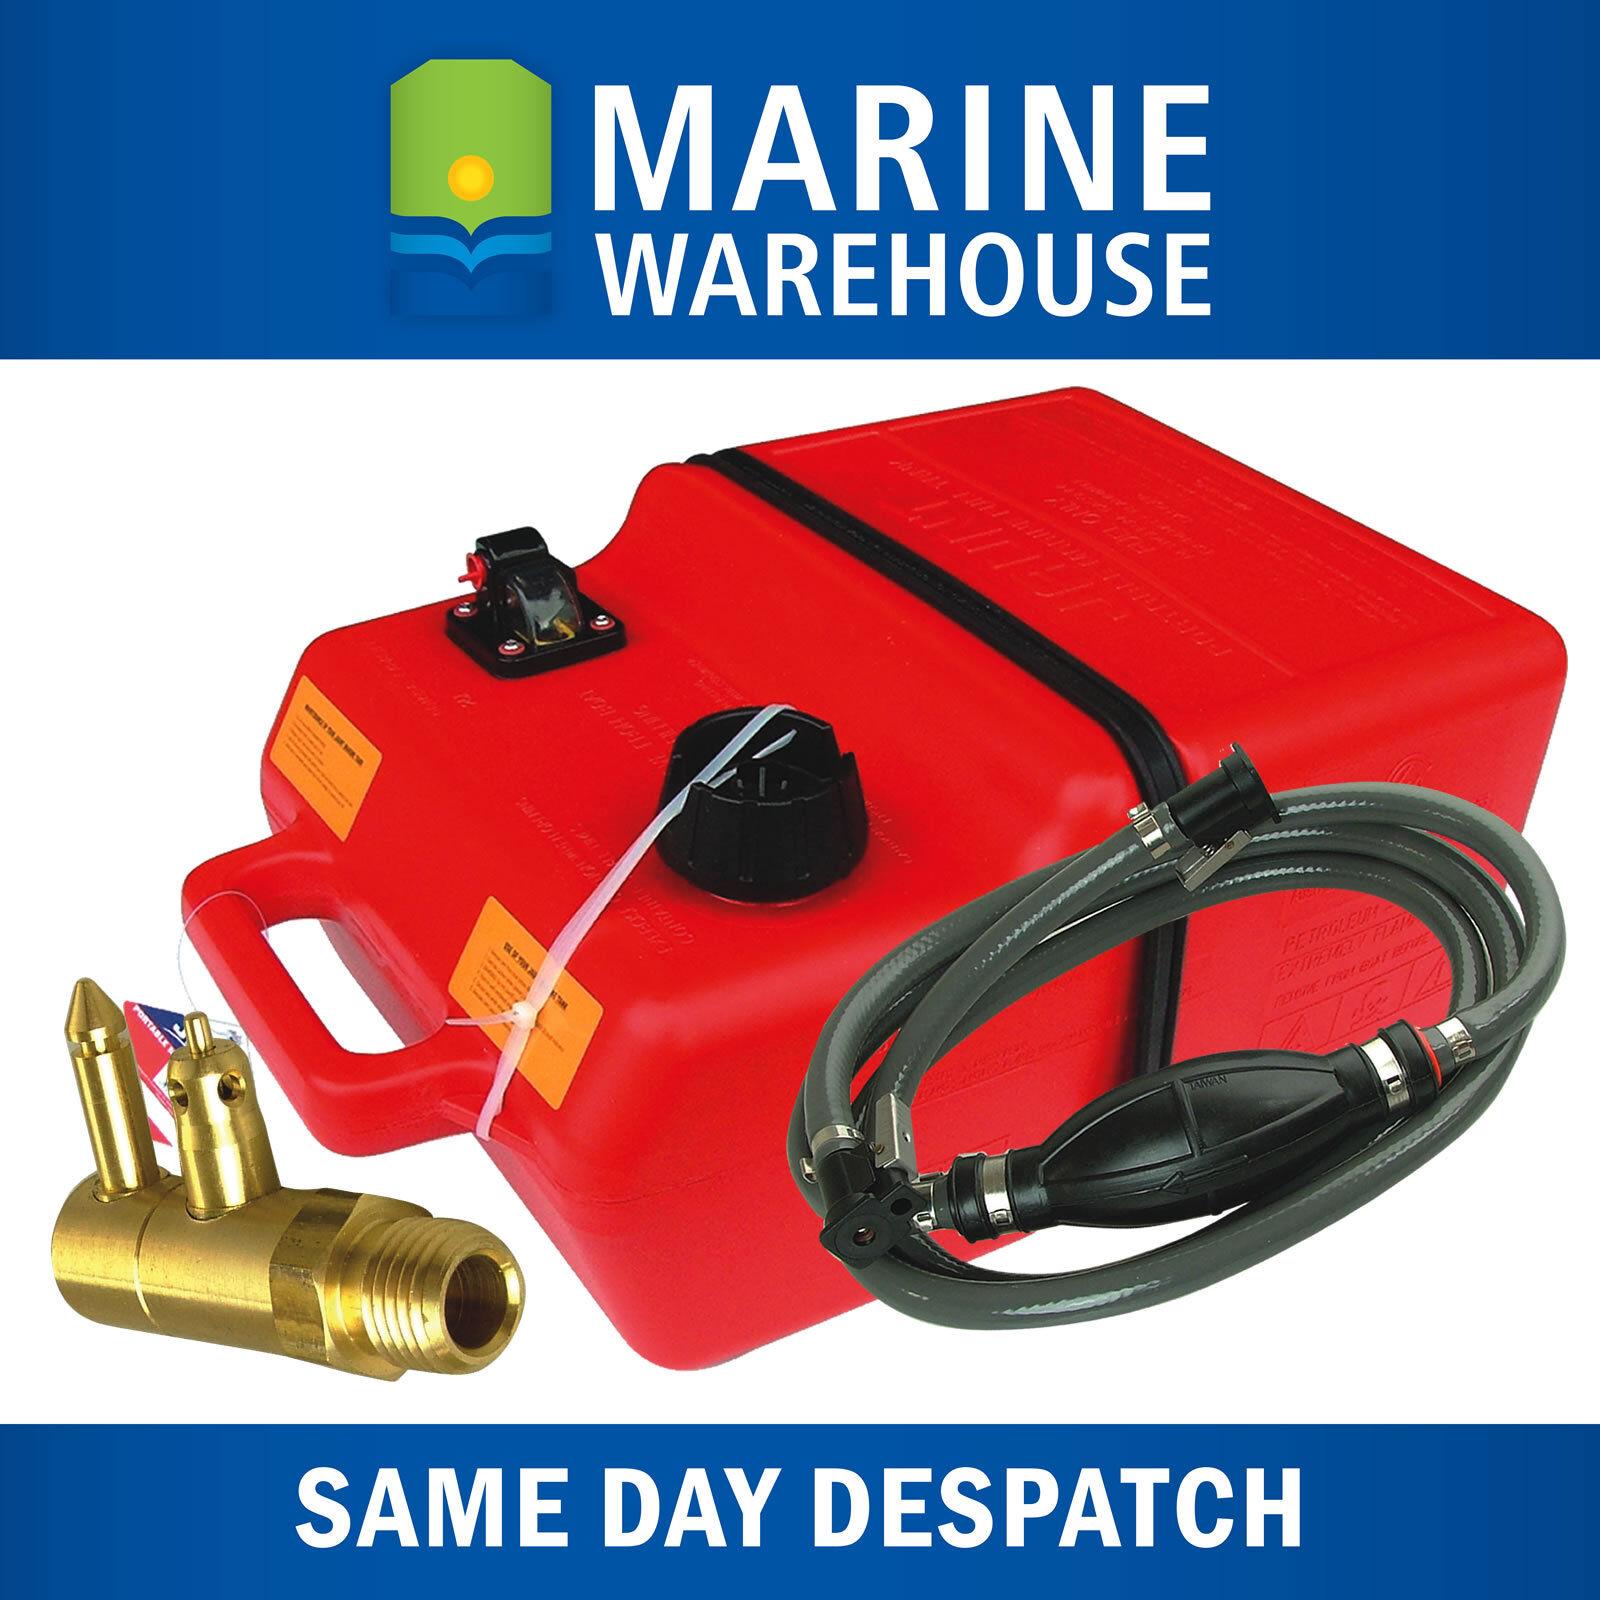 Outboard Fuel Tank 25L Kit W/ Yamaha Fuel Line & Tank Adaptor 25 Litre 202900YM